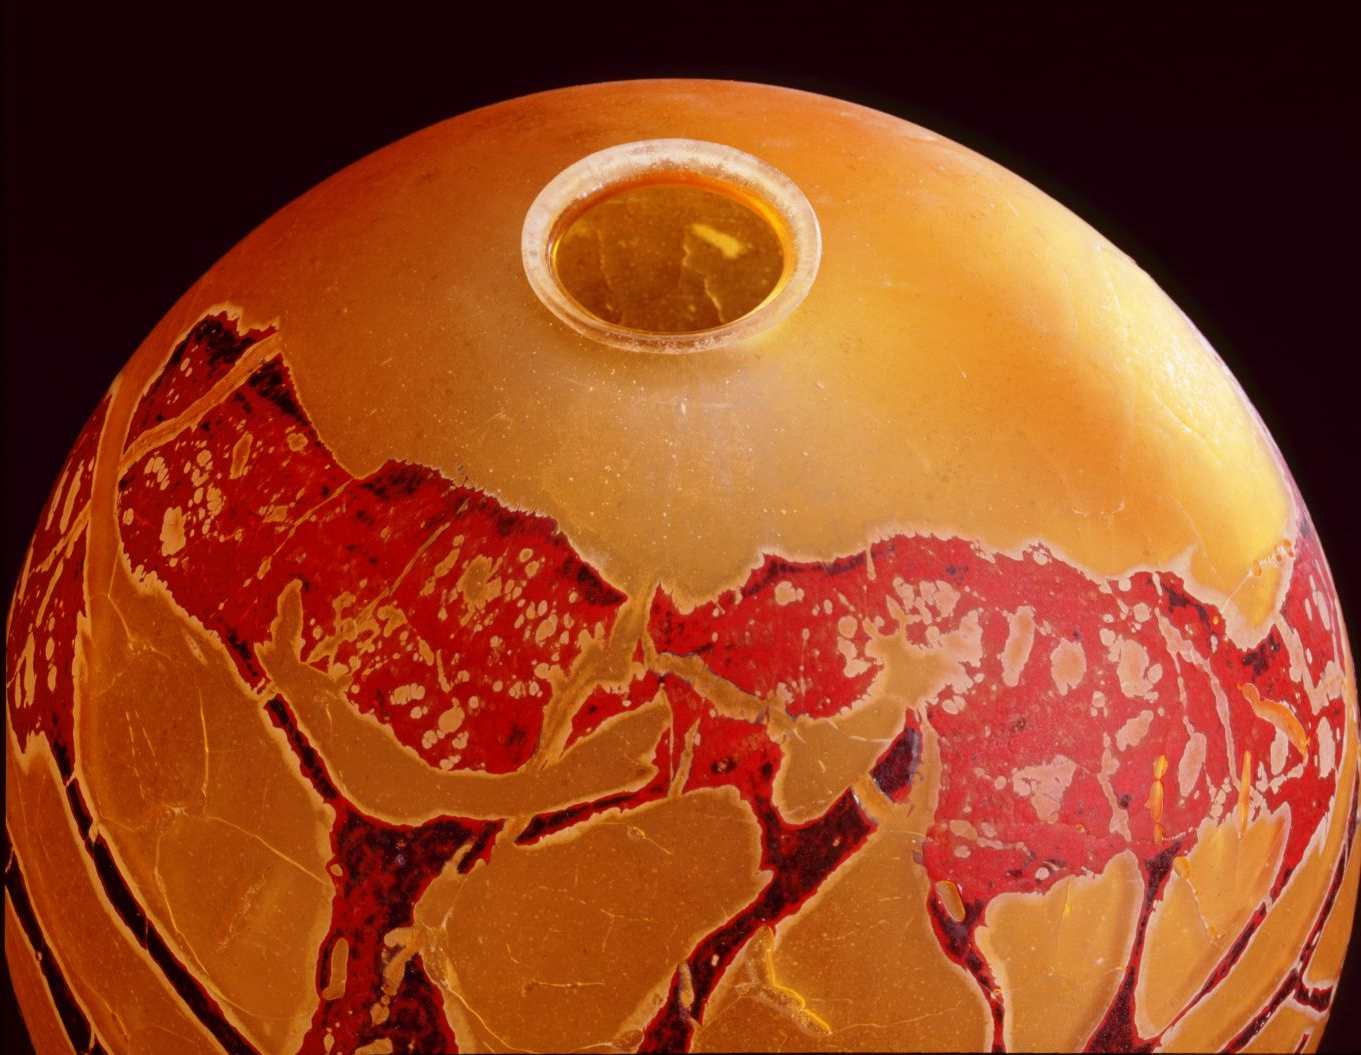 Detail - William Morris, Globe Vessel with Juniper Tree Form (2004, glass, 11 1/8 x 9 3/4 x 9 3/4 inches), WM.22